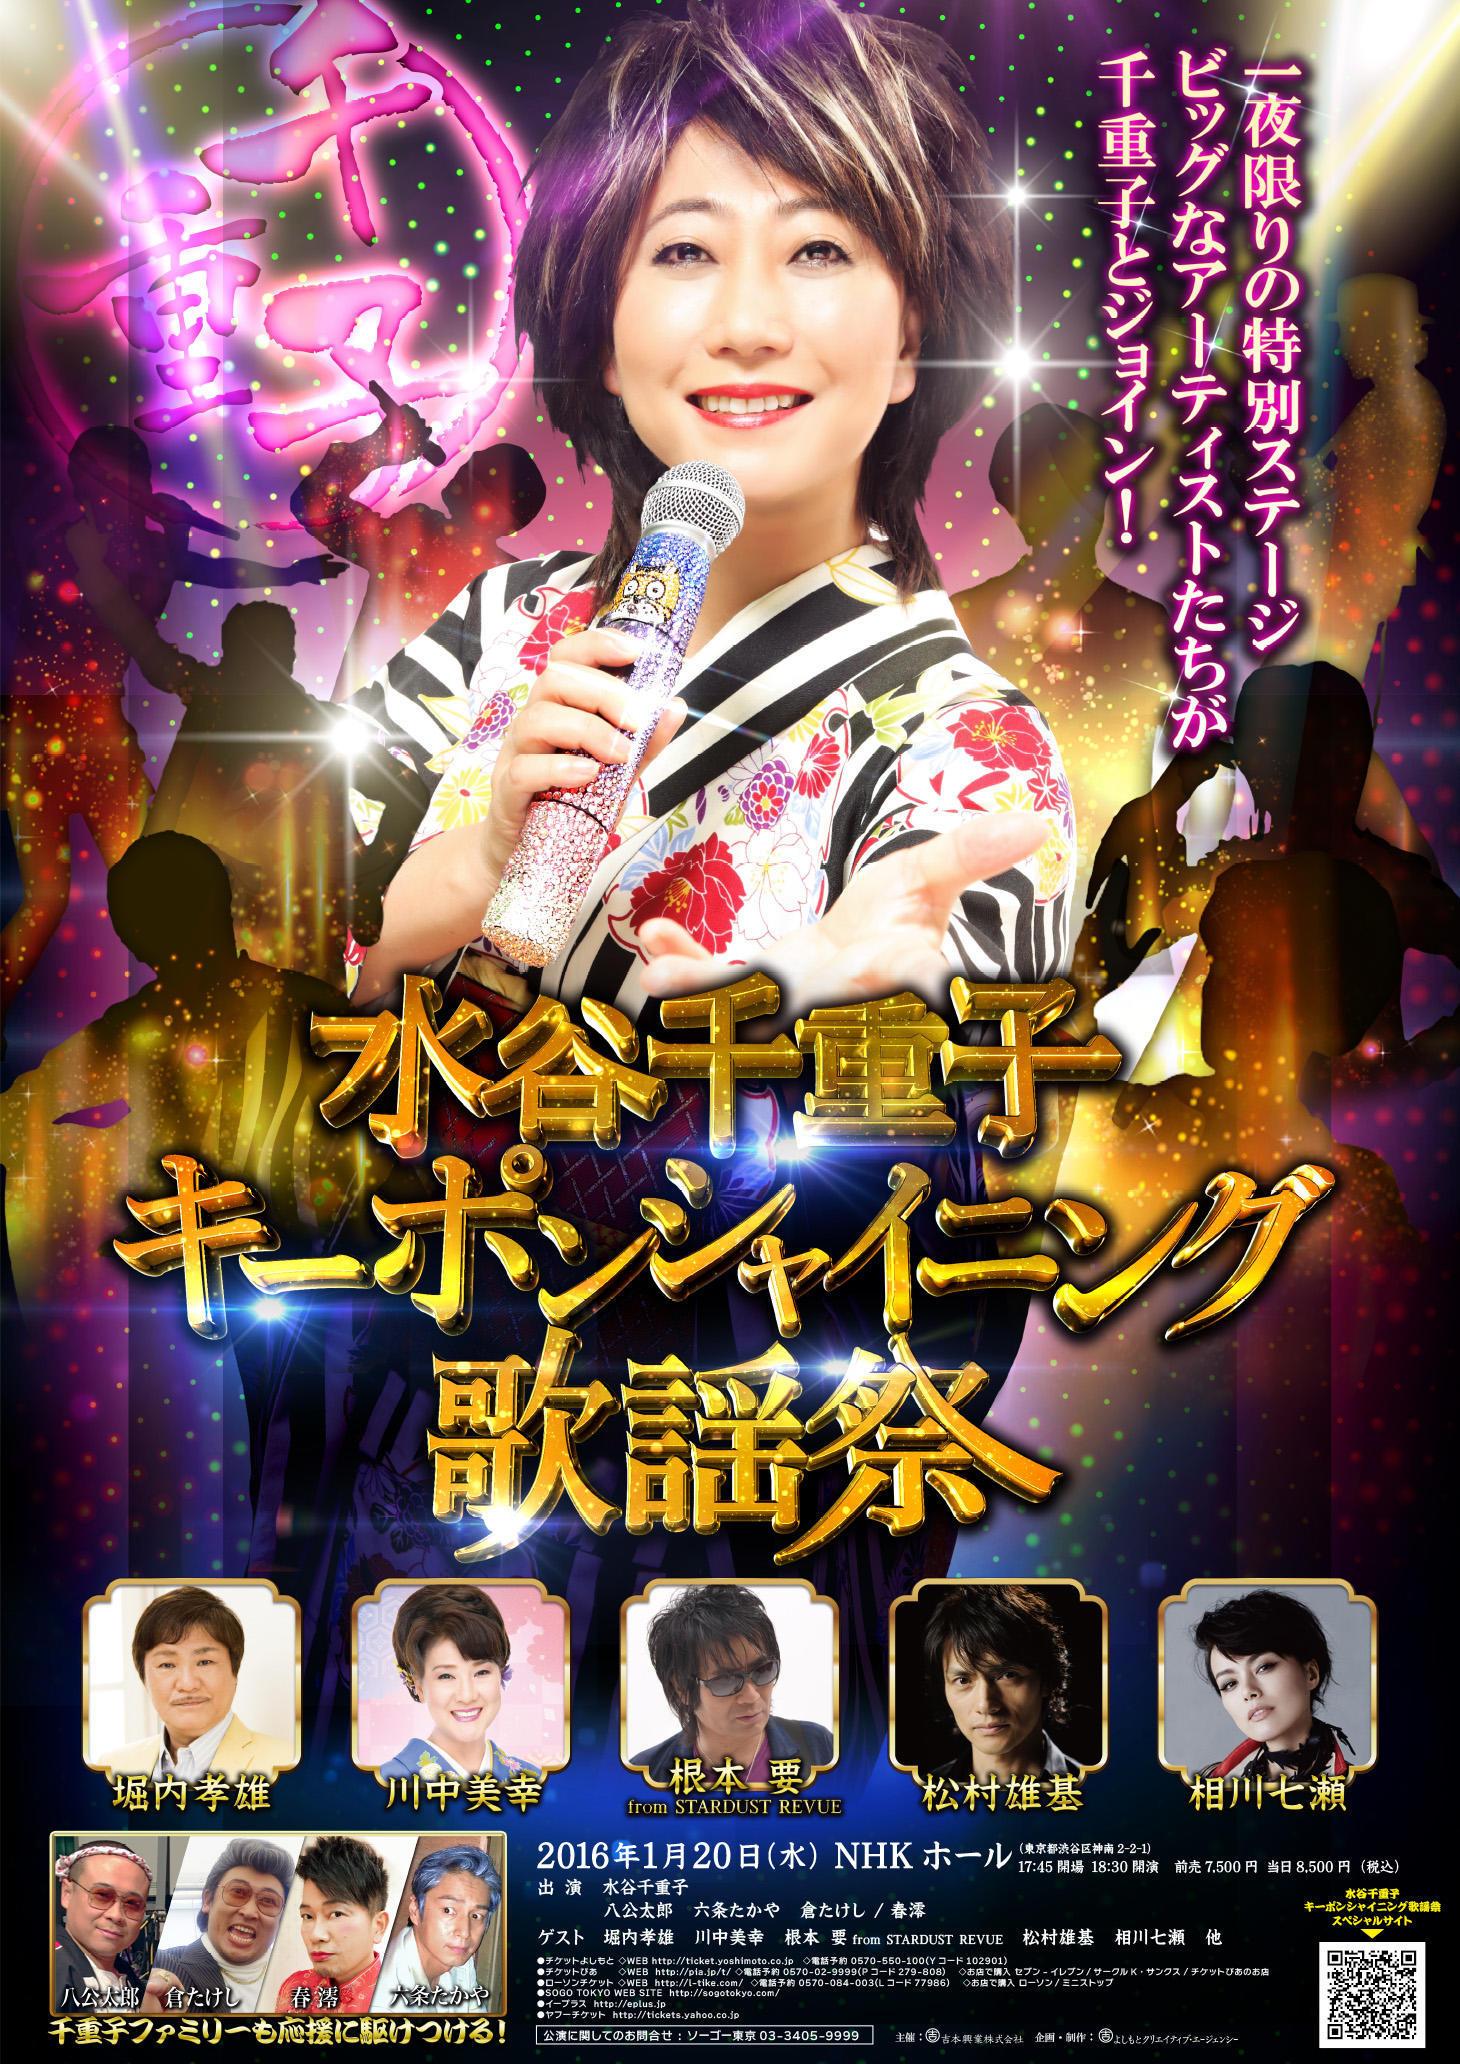 http://news.yoshimoto.co.jp/20160430143401-bb69930d3a72ae4d2d1a38a6d4f61e88b7d317c7.jpg